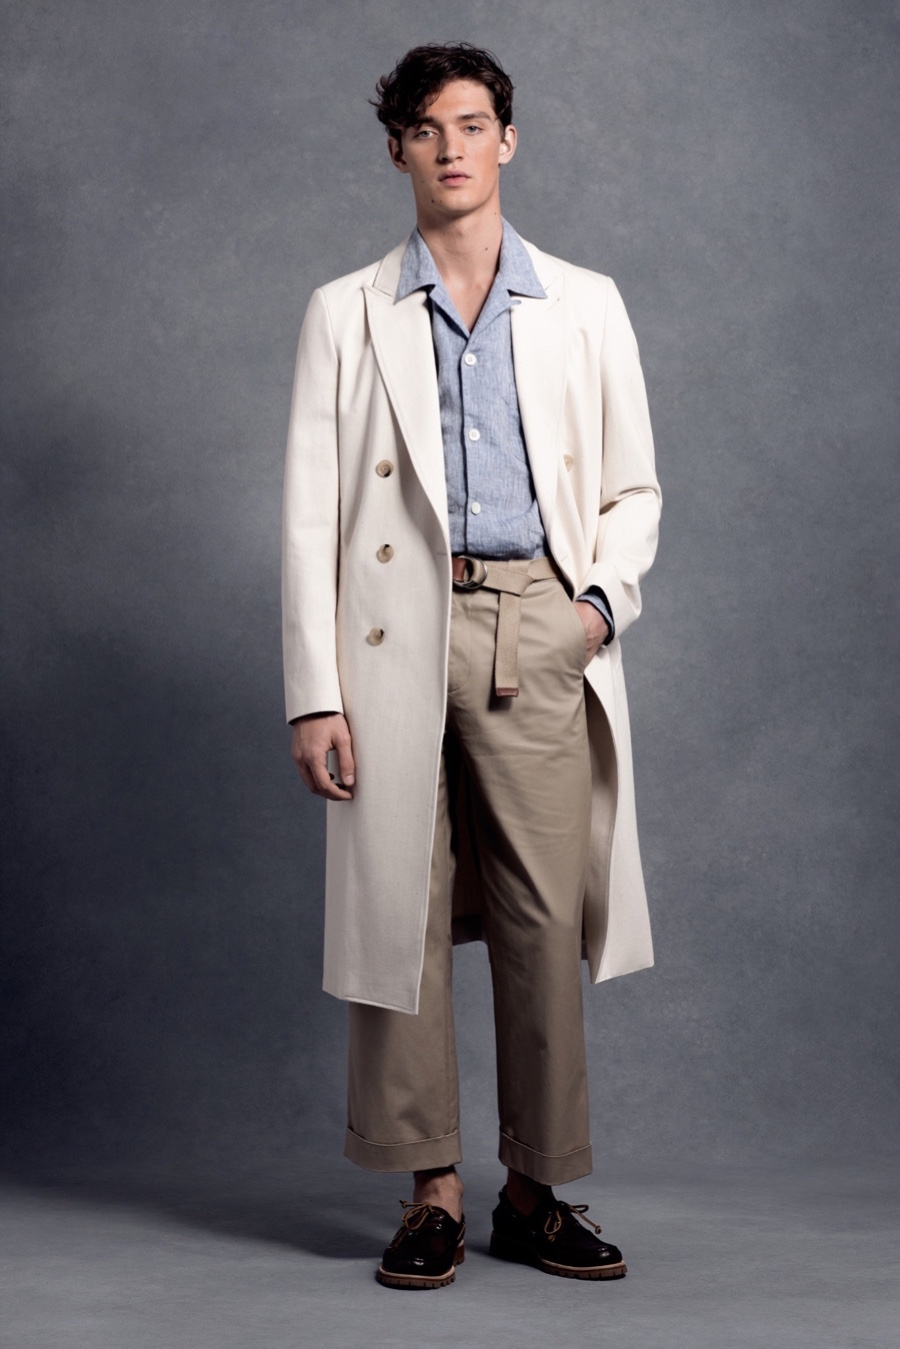 Michael Kors Spring/Summer 2016 Collection | New York Fashion Week: Men